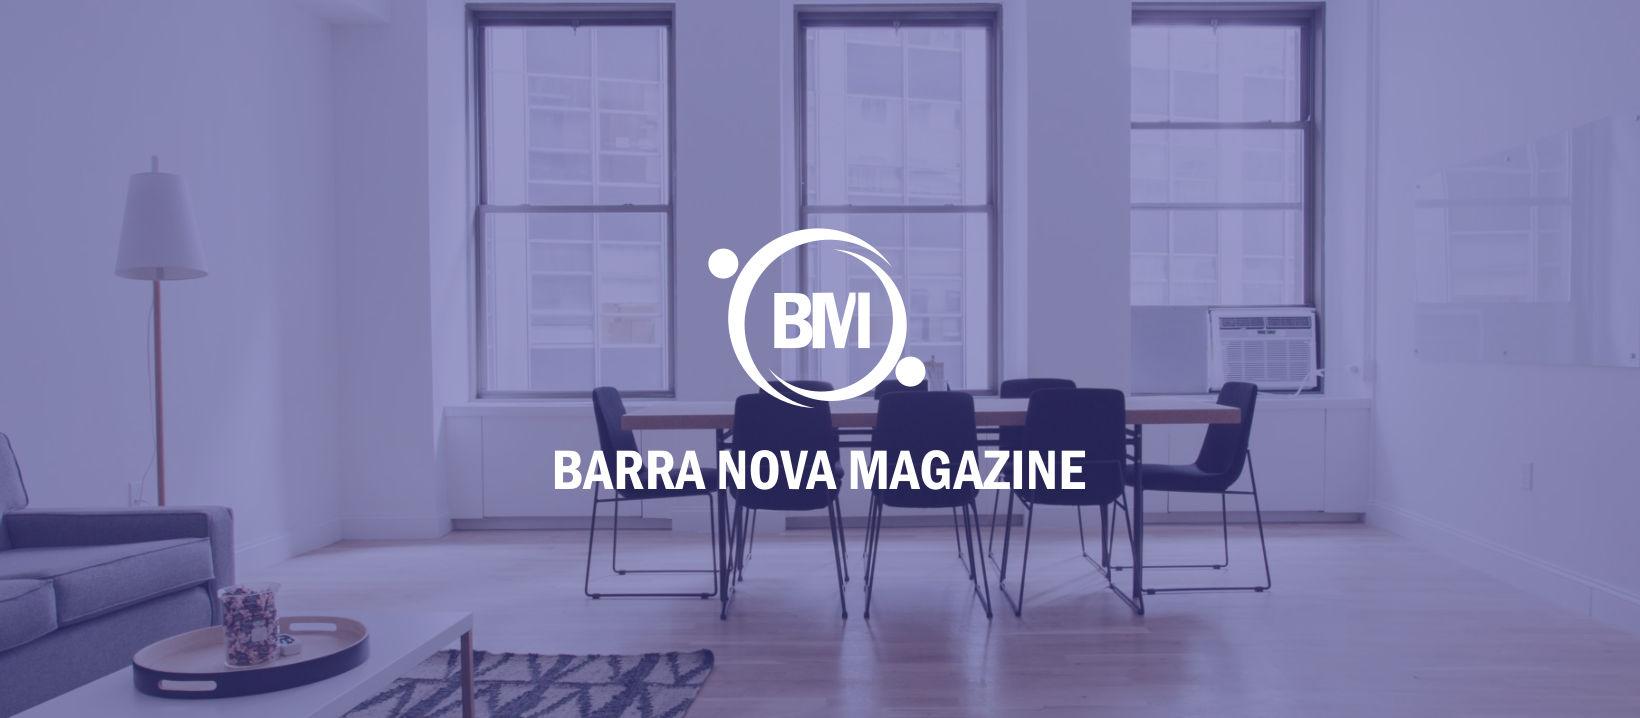 A Barra Nova Magazine